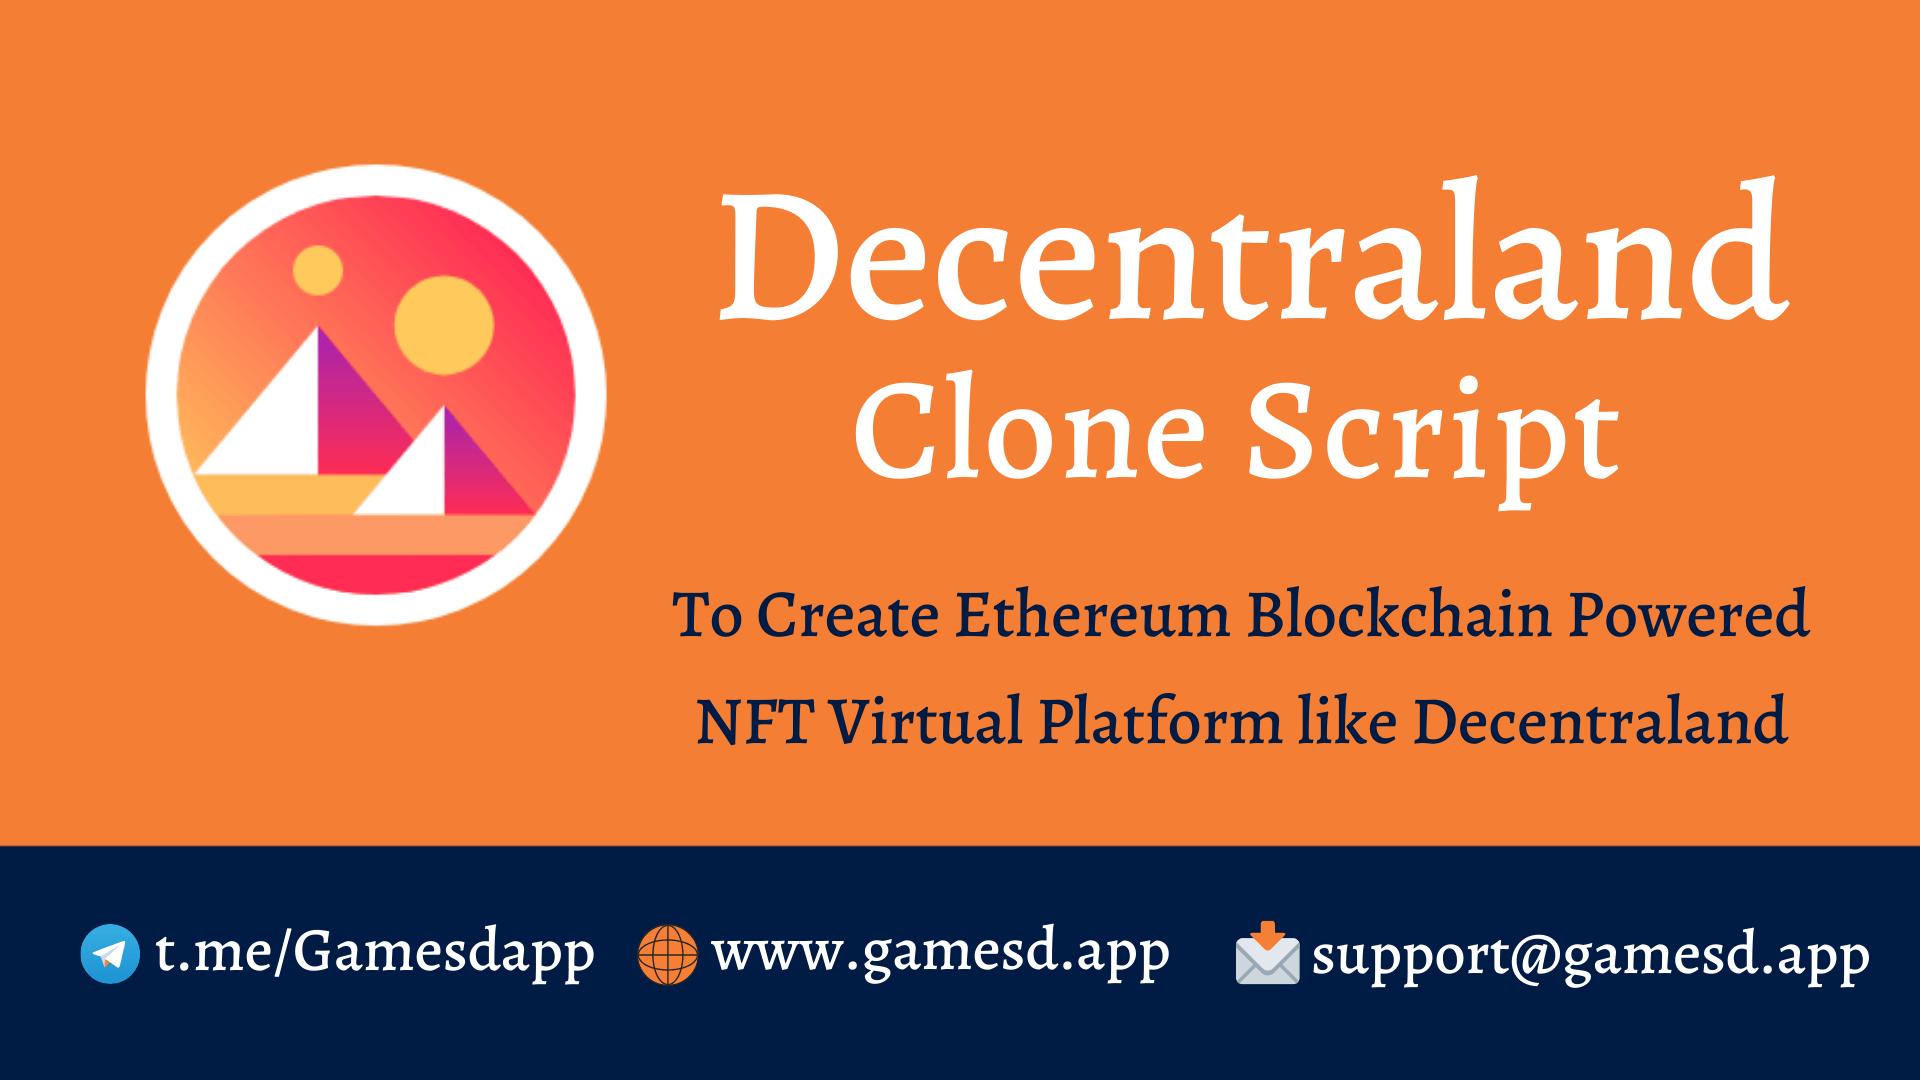 Decentraland Clone Script - To Start A NFT Marketplace Like Decentraland